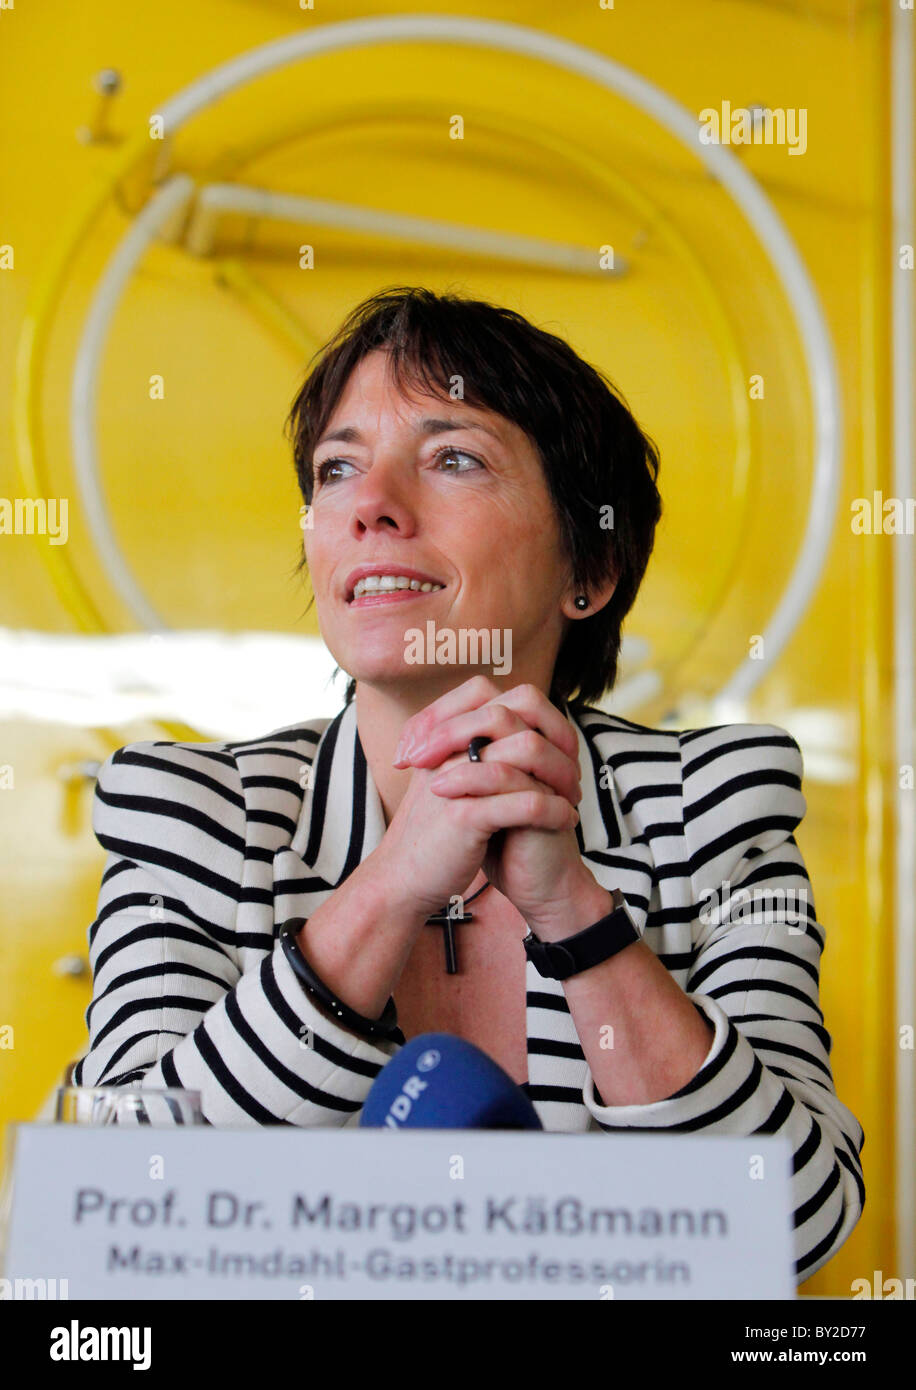 Prof. Dr. Margot Kaessmann Käßmann Ruhr University - Stock Image